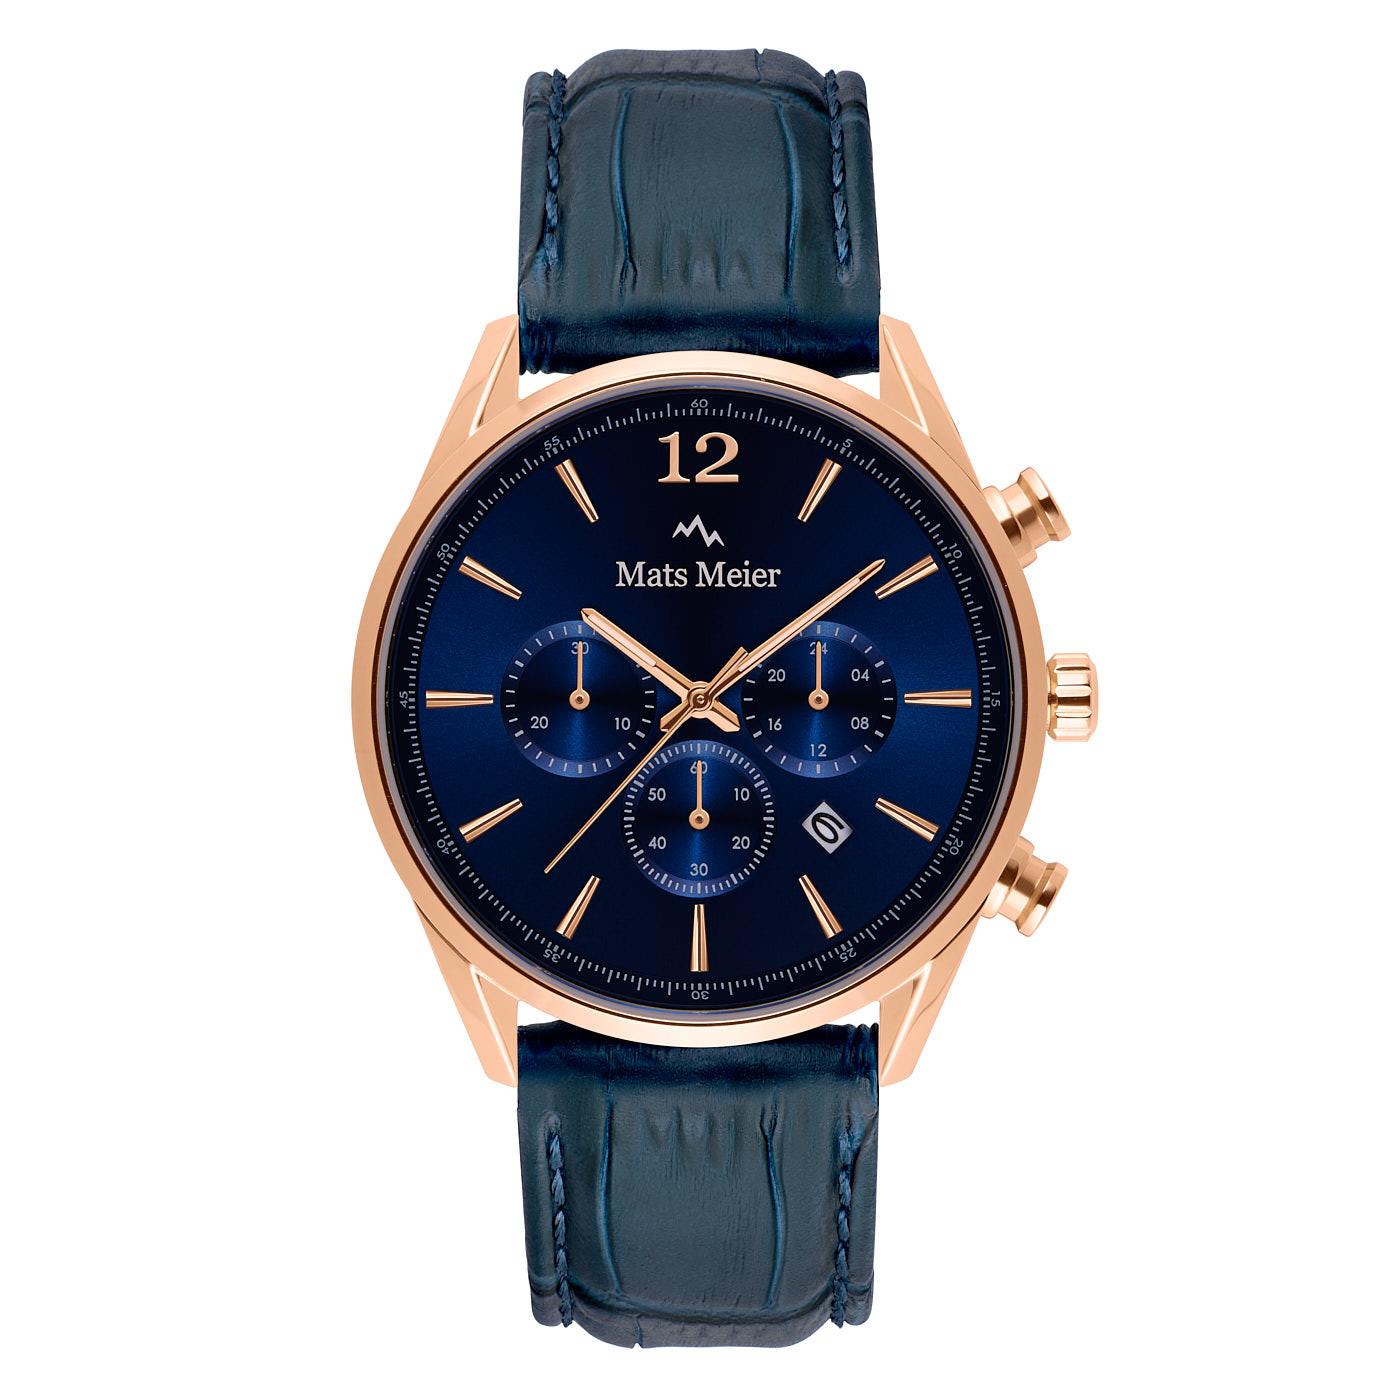 Mats Meier Grand Cornier chronograph Blau / Roségoldfarben